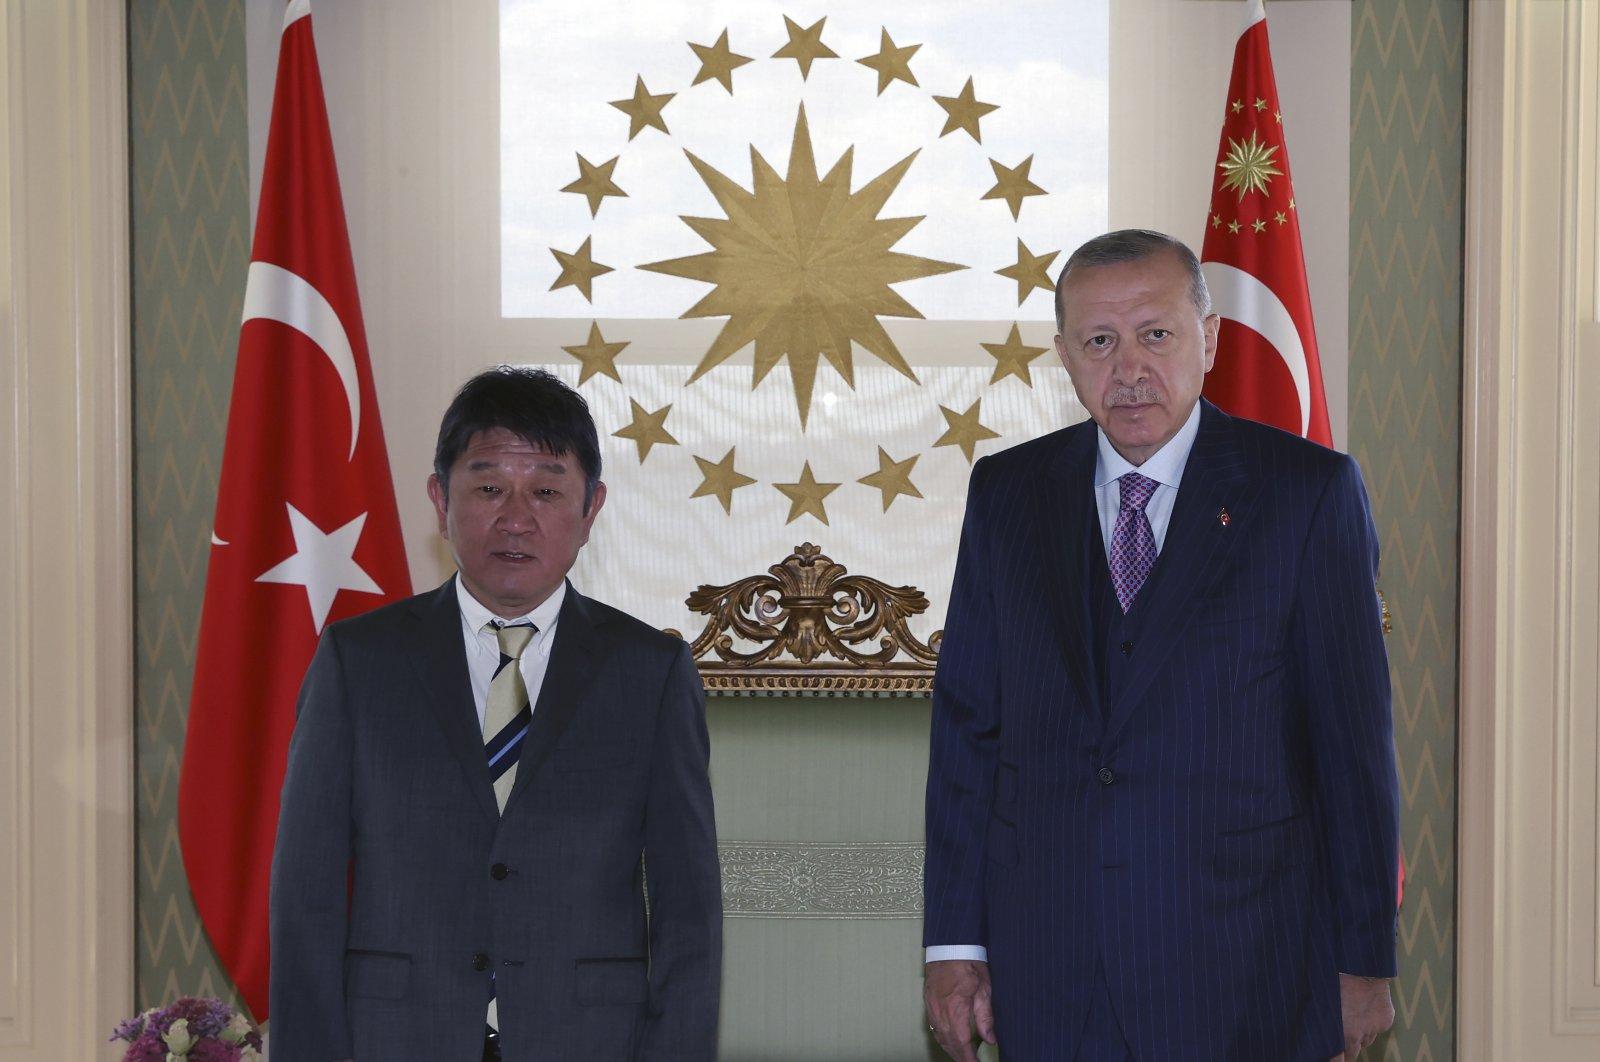 Turkey's President Recep Tayyip Erdoğan (R) and Japan's Foreign Minister Toshimitsu Motegi pose for photos before a meeting, in Istanbul, Turkey, Aug. 20, 2021. (Turkish Presidency via AP)